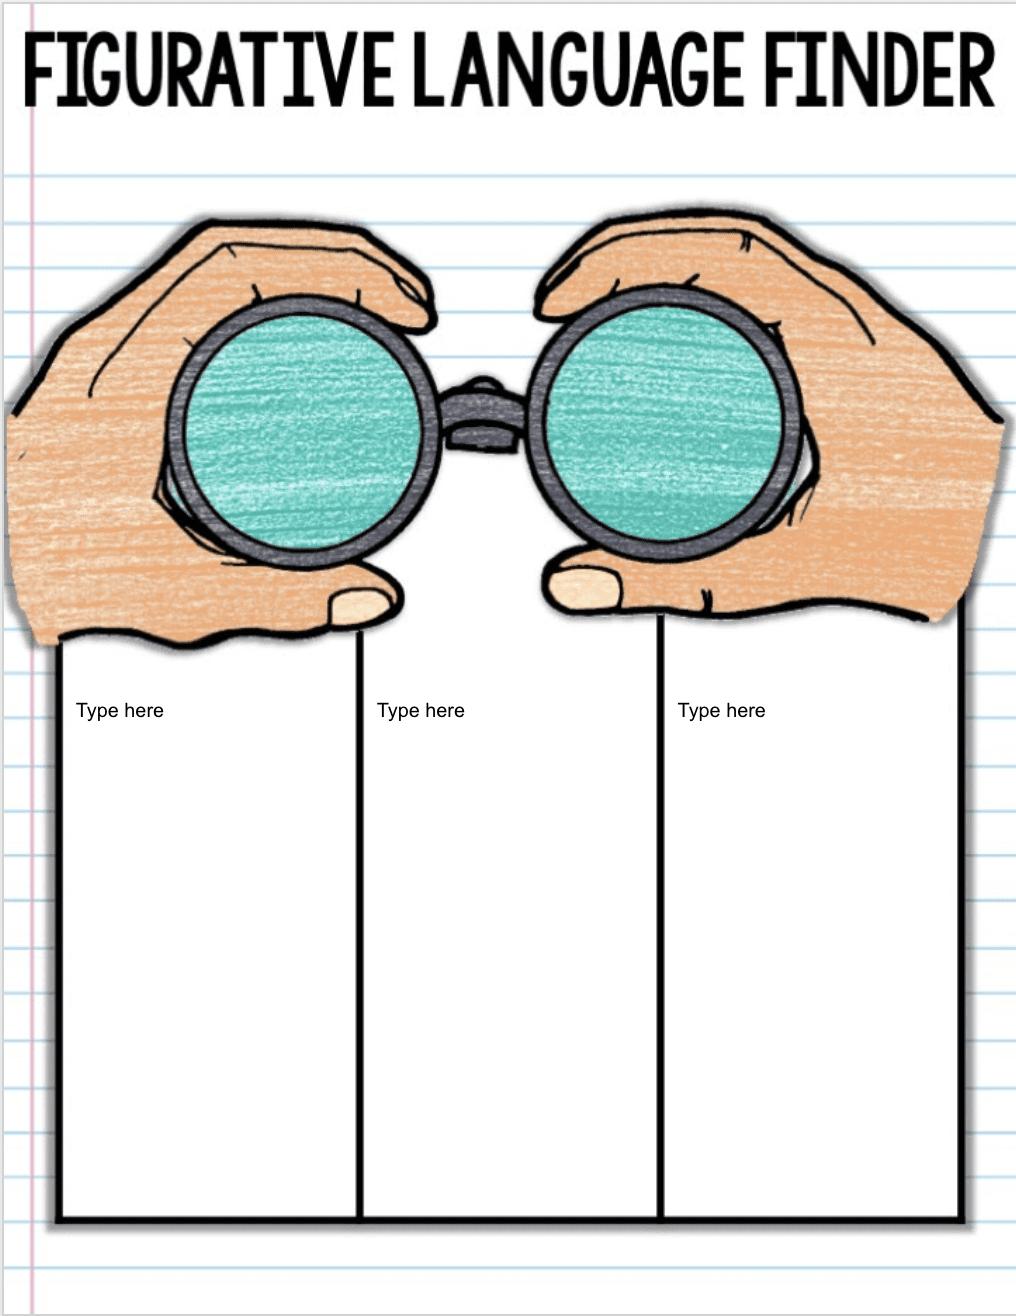 Language arts worksheet for Figurative Language Finder role